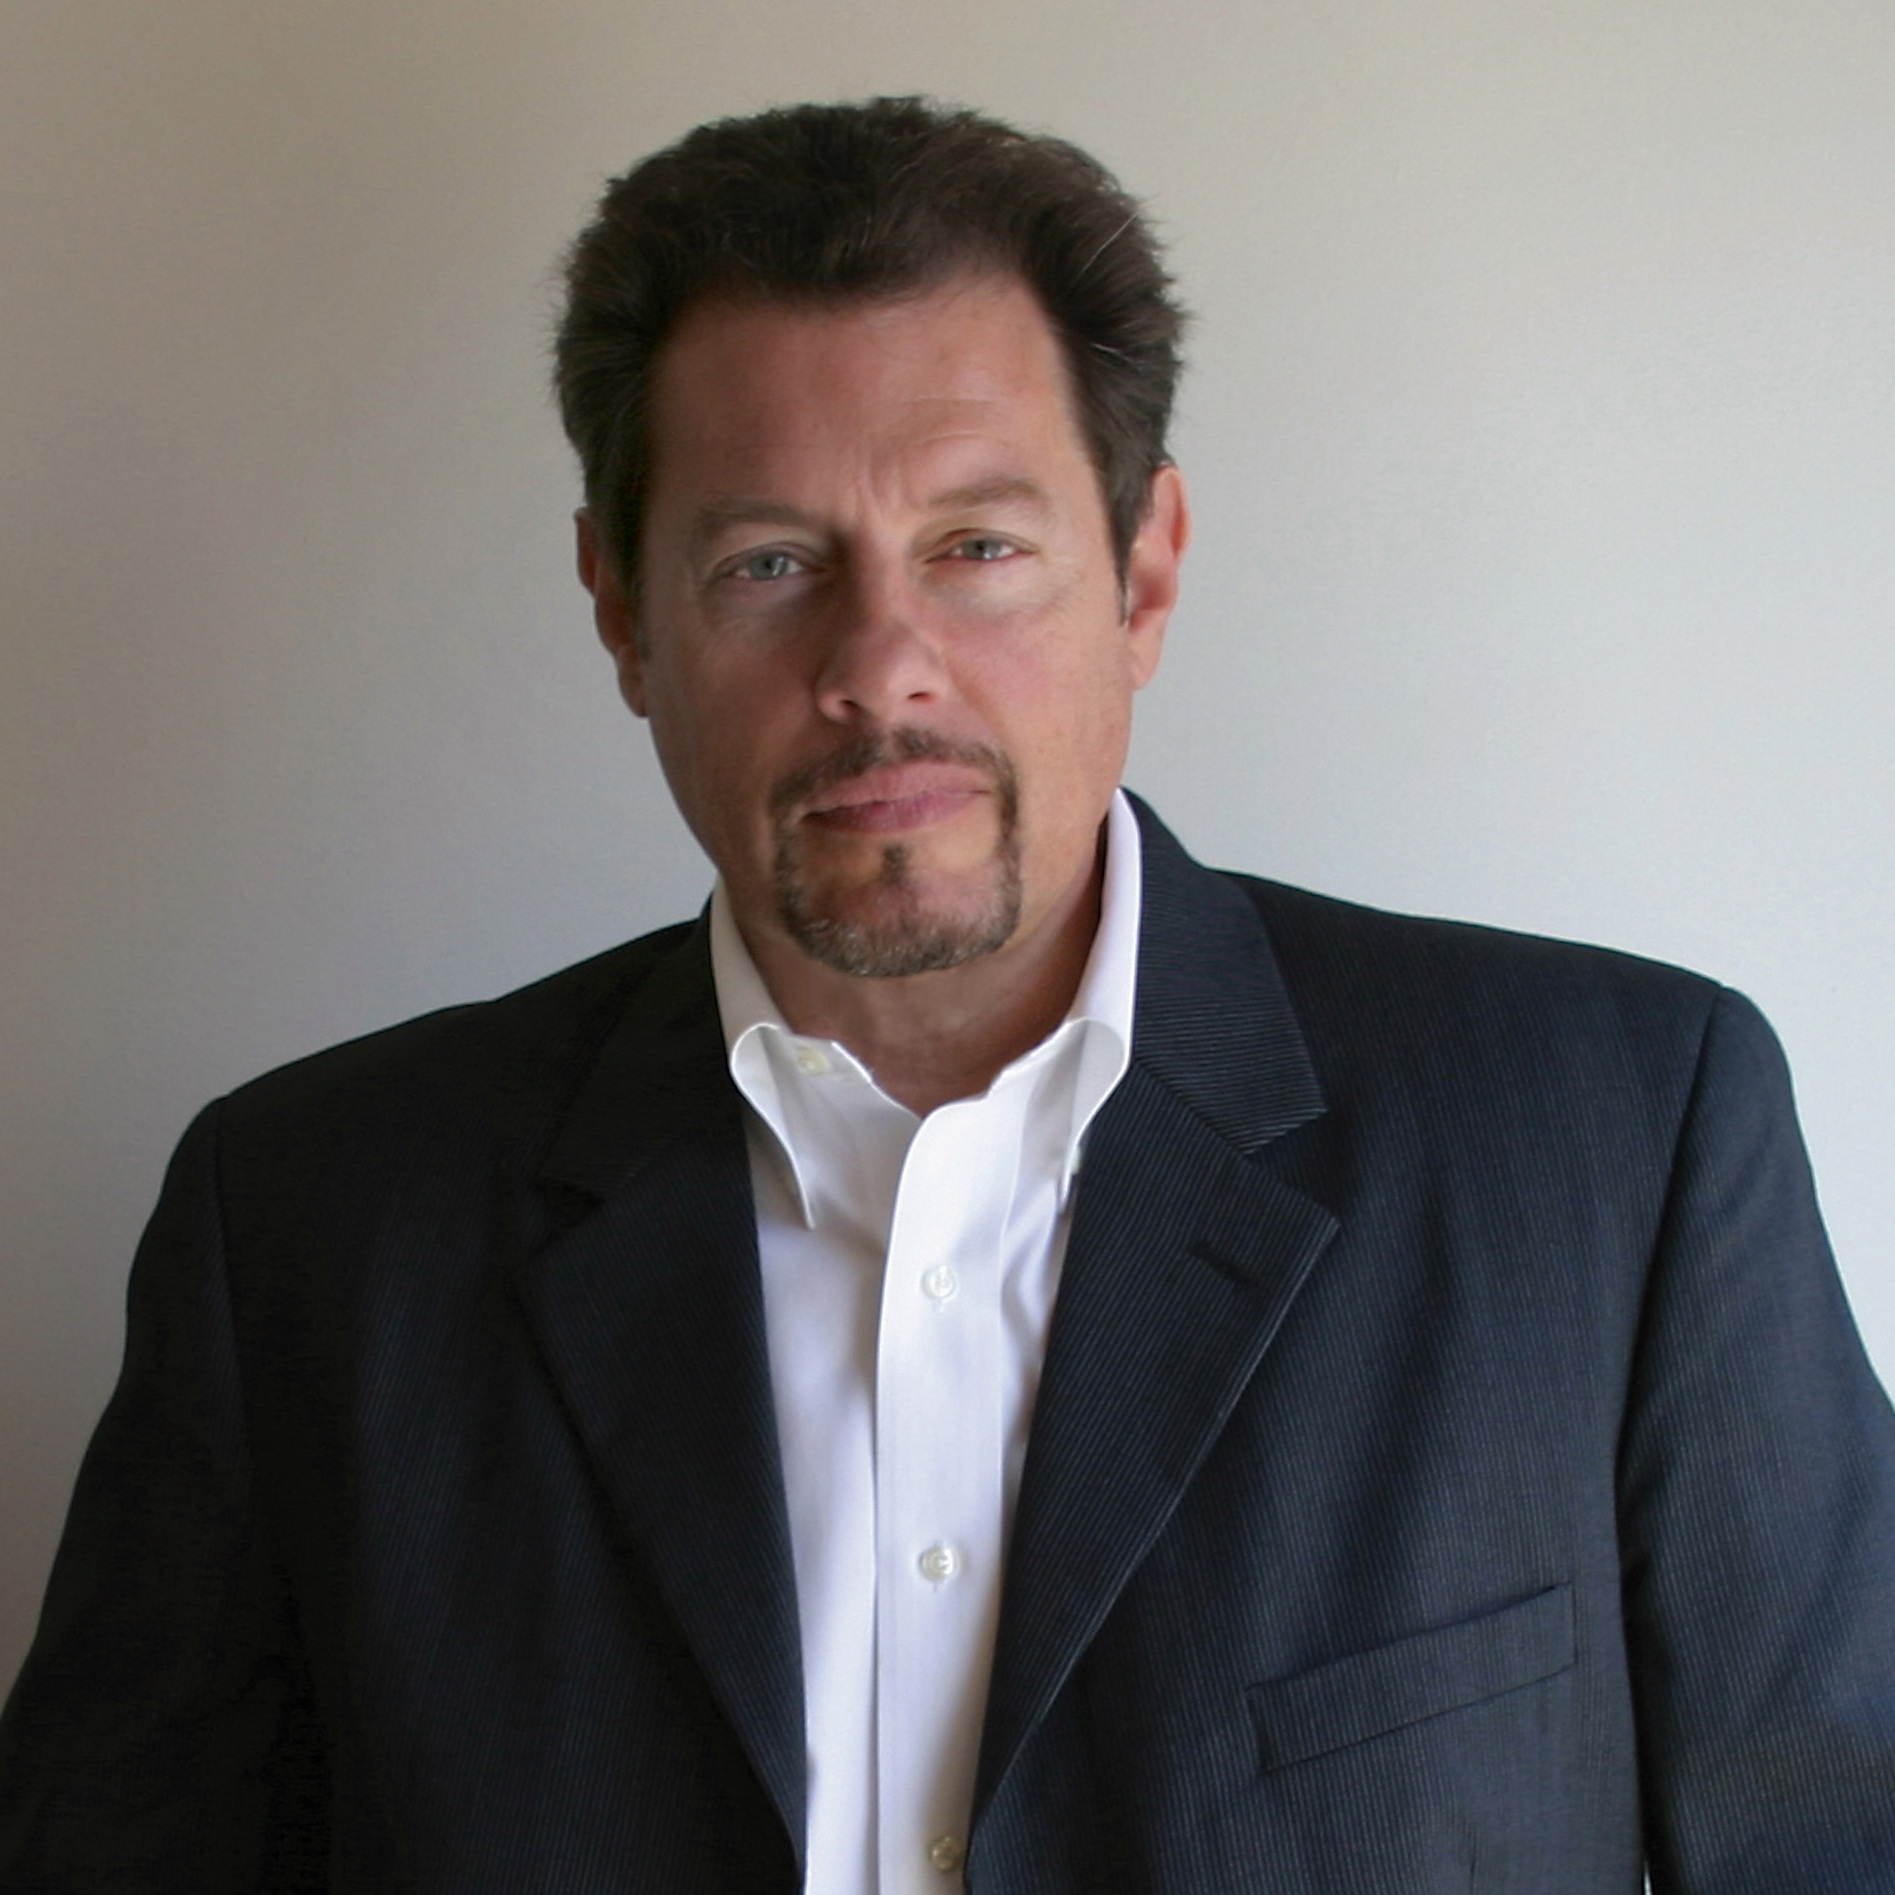 Stephen C Kuhlman